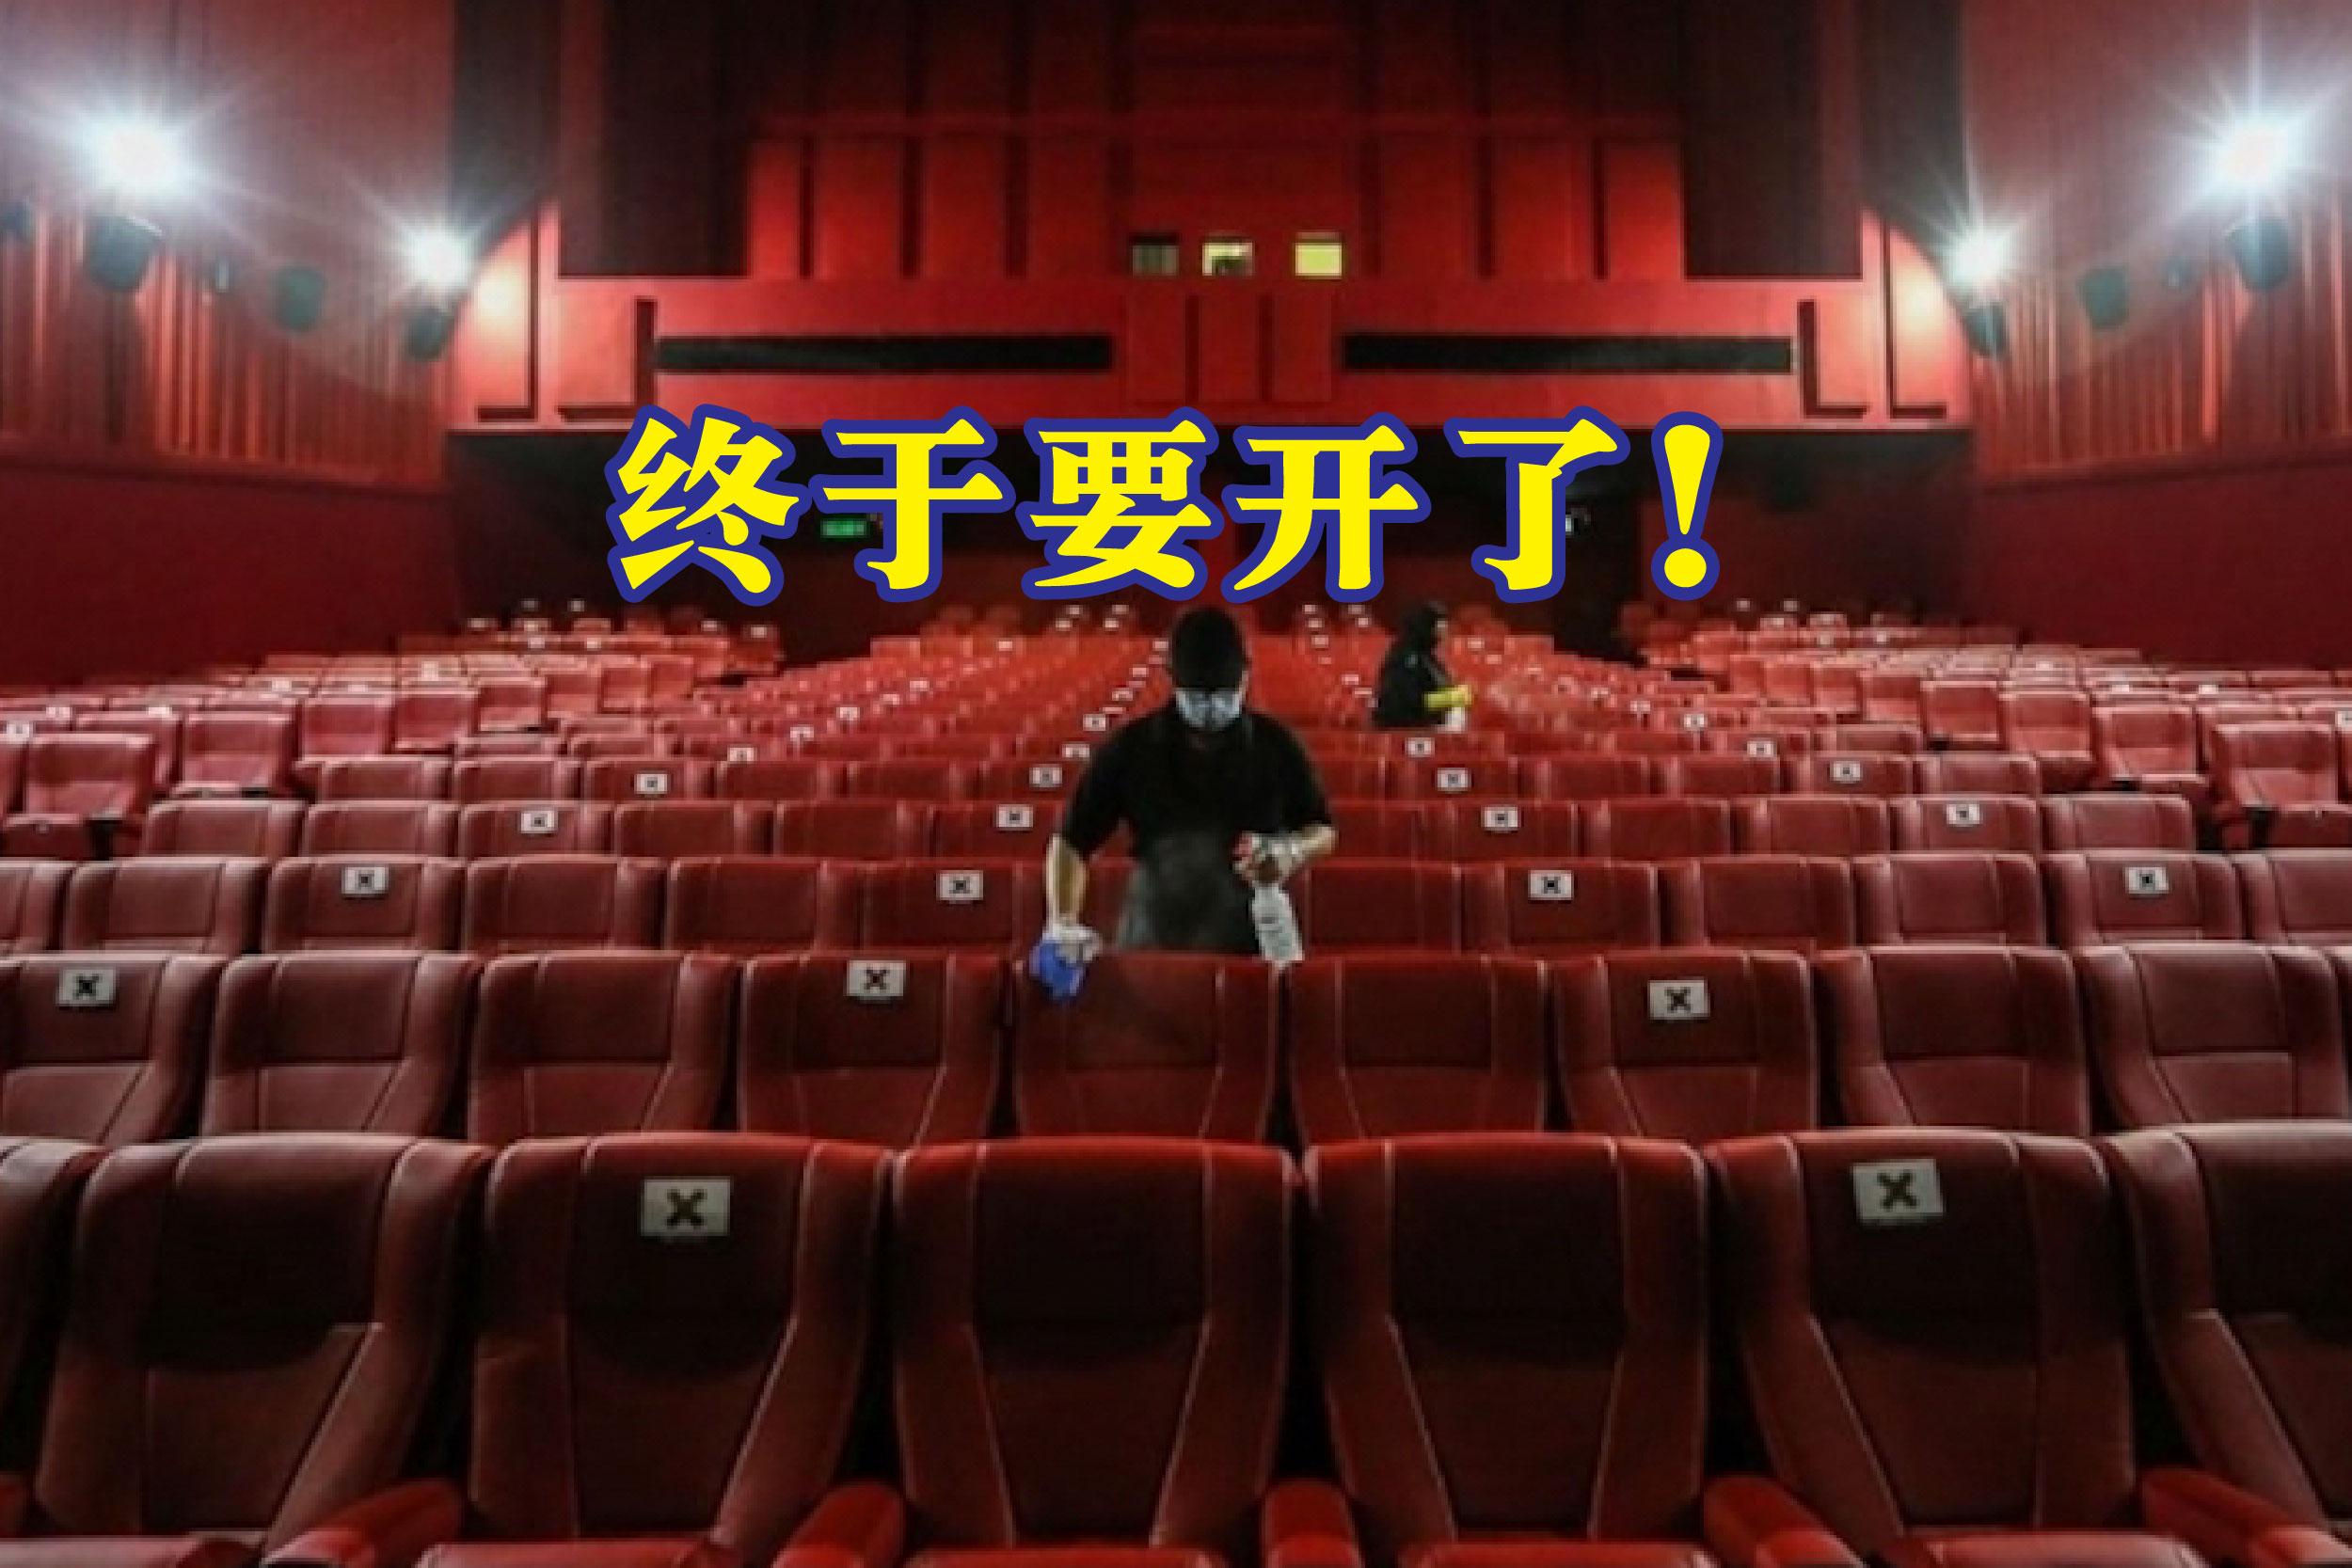 TGV电影院将从9月23日(下周四)起重新开业!-Yusof Mat Isa摄/精彩大马制图-